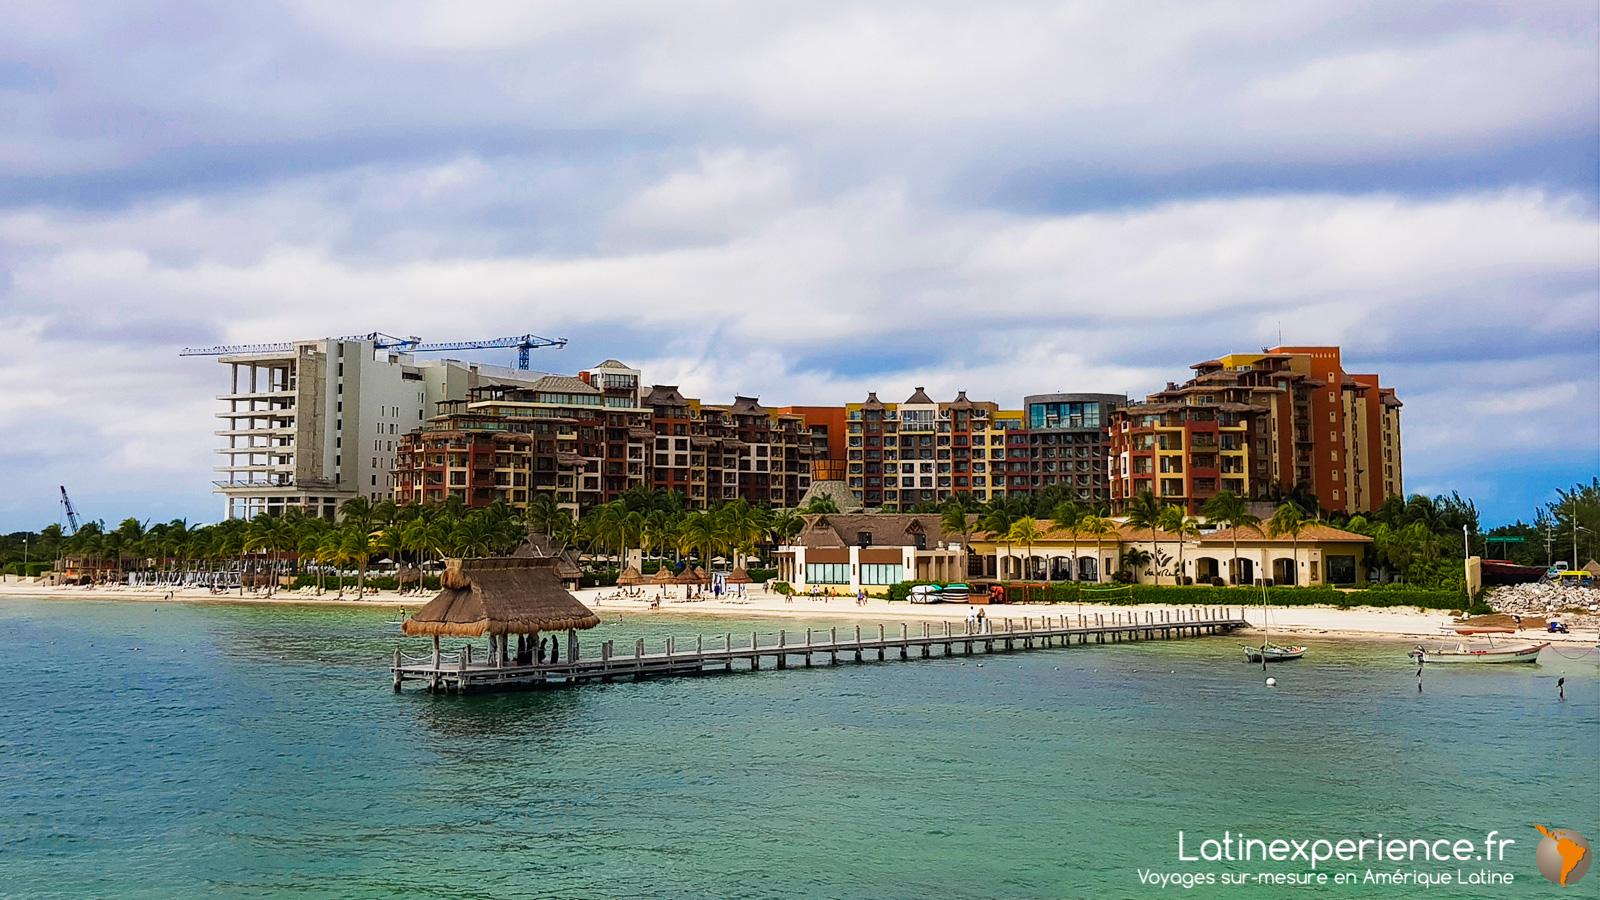 Mexique - Isla Mujeres - Punta Sam - Latinexperience voyages